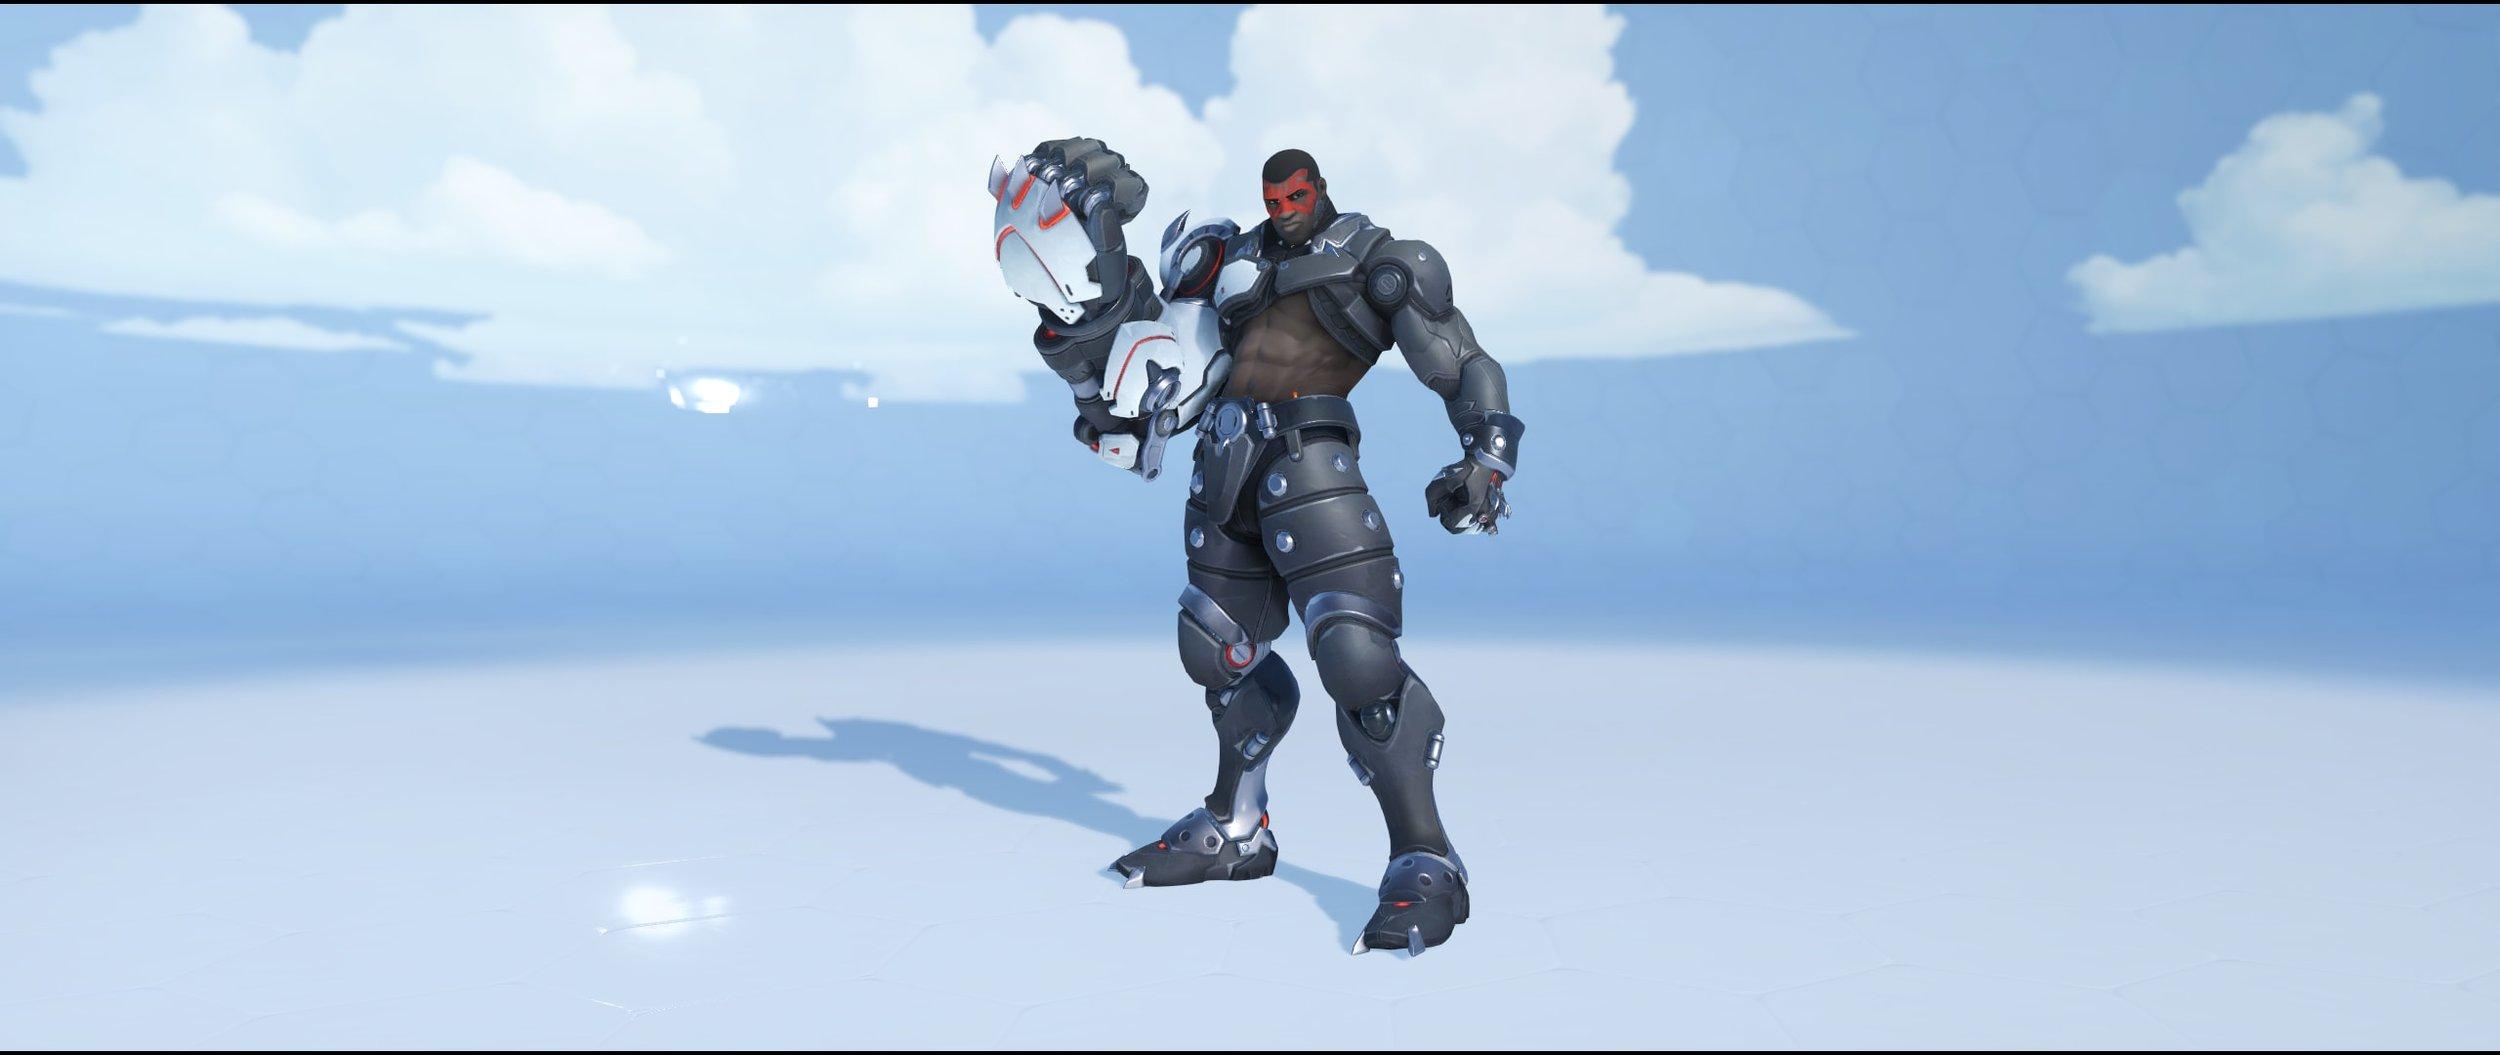 Talon front legendary Archives skin Doomfist Overwatch.jpg